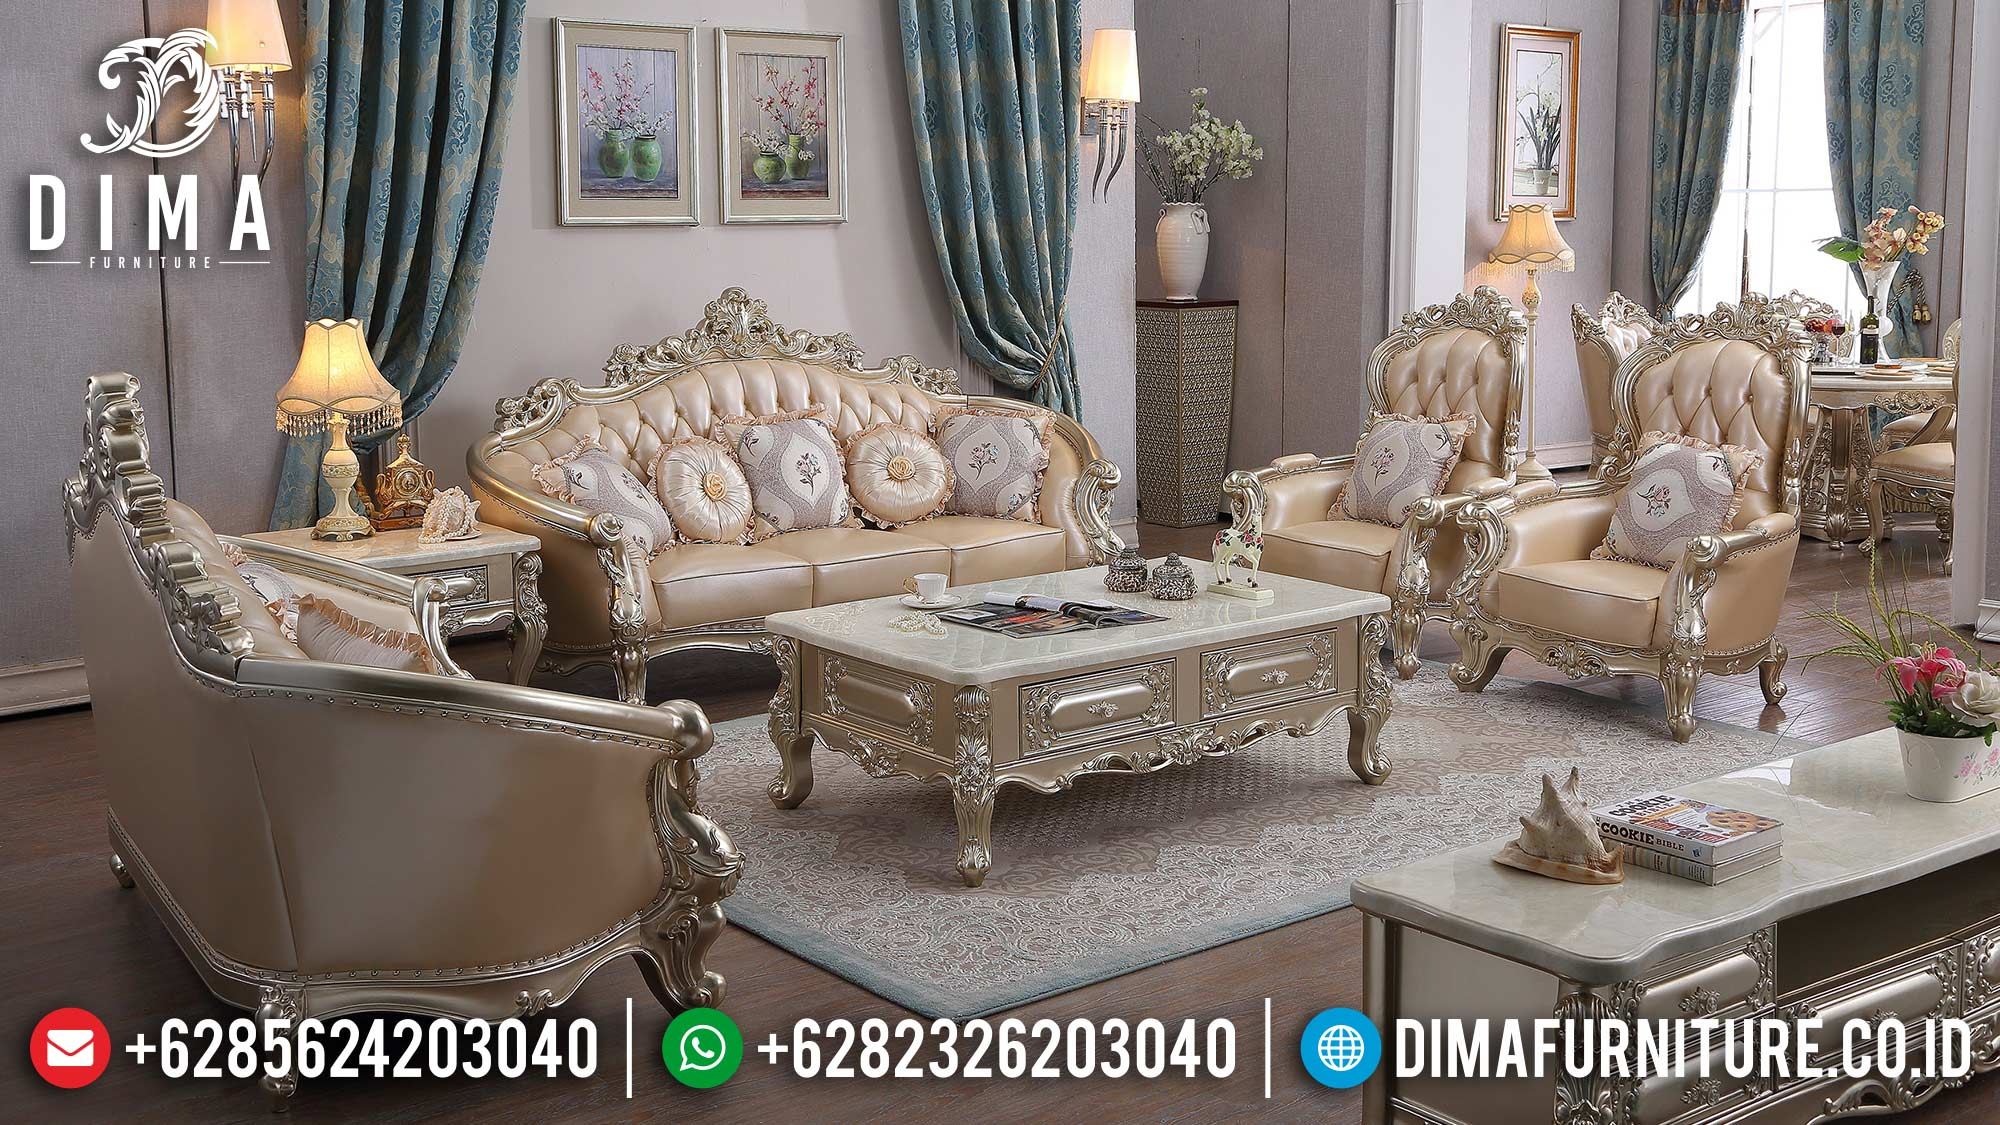 Jual Sofa Tamu Mewah Classic Luxury Design Best Quality Product ST-1355